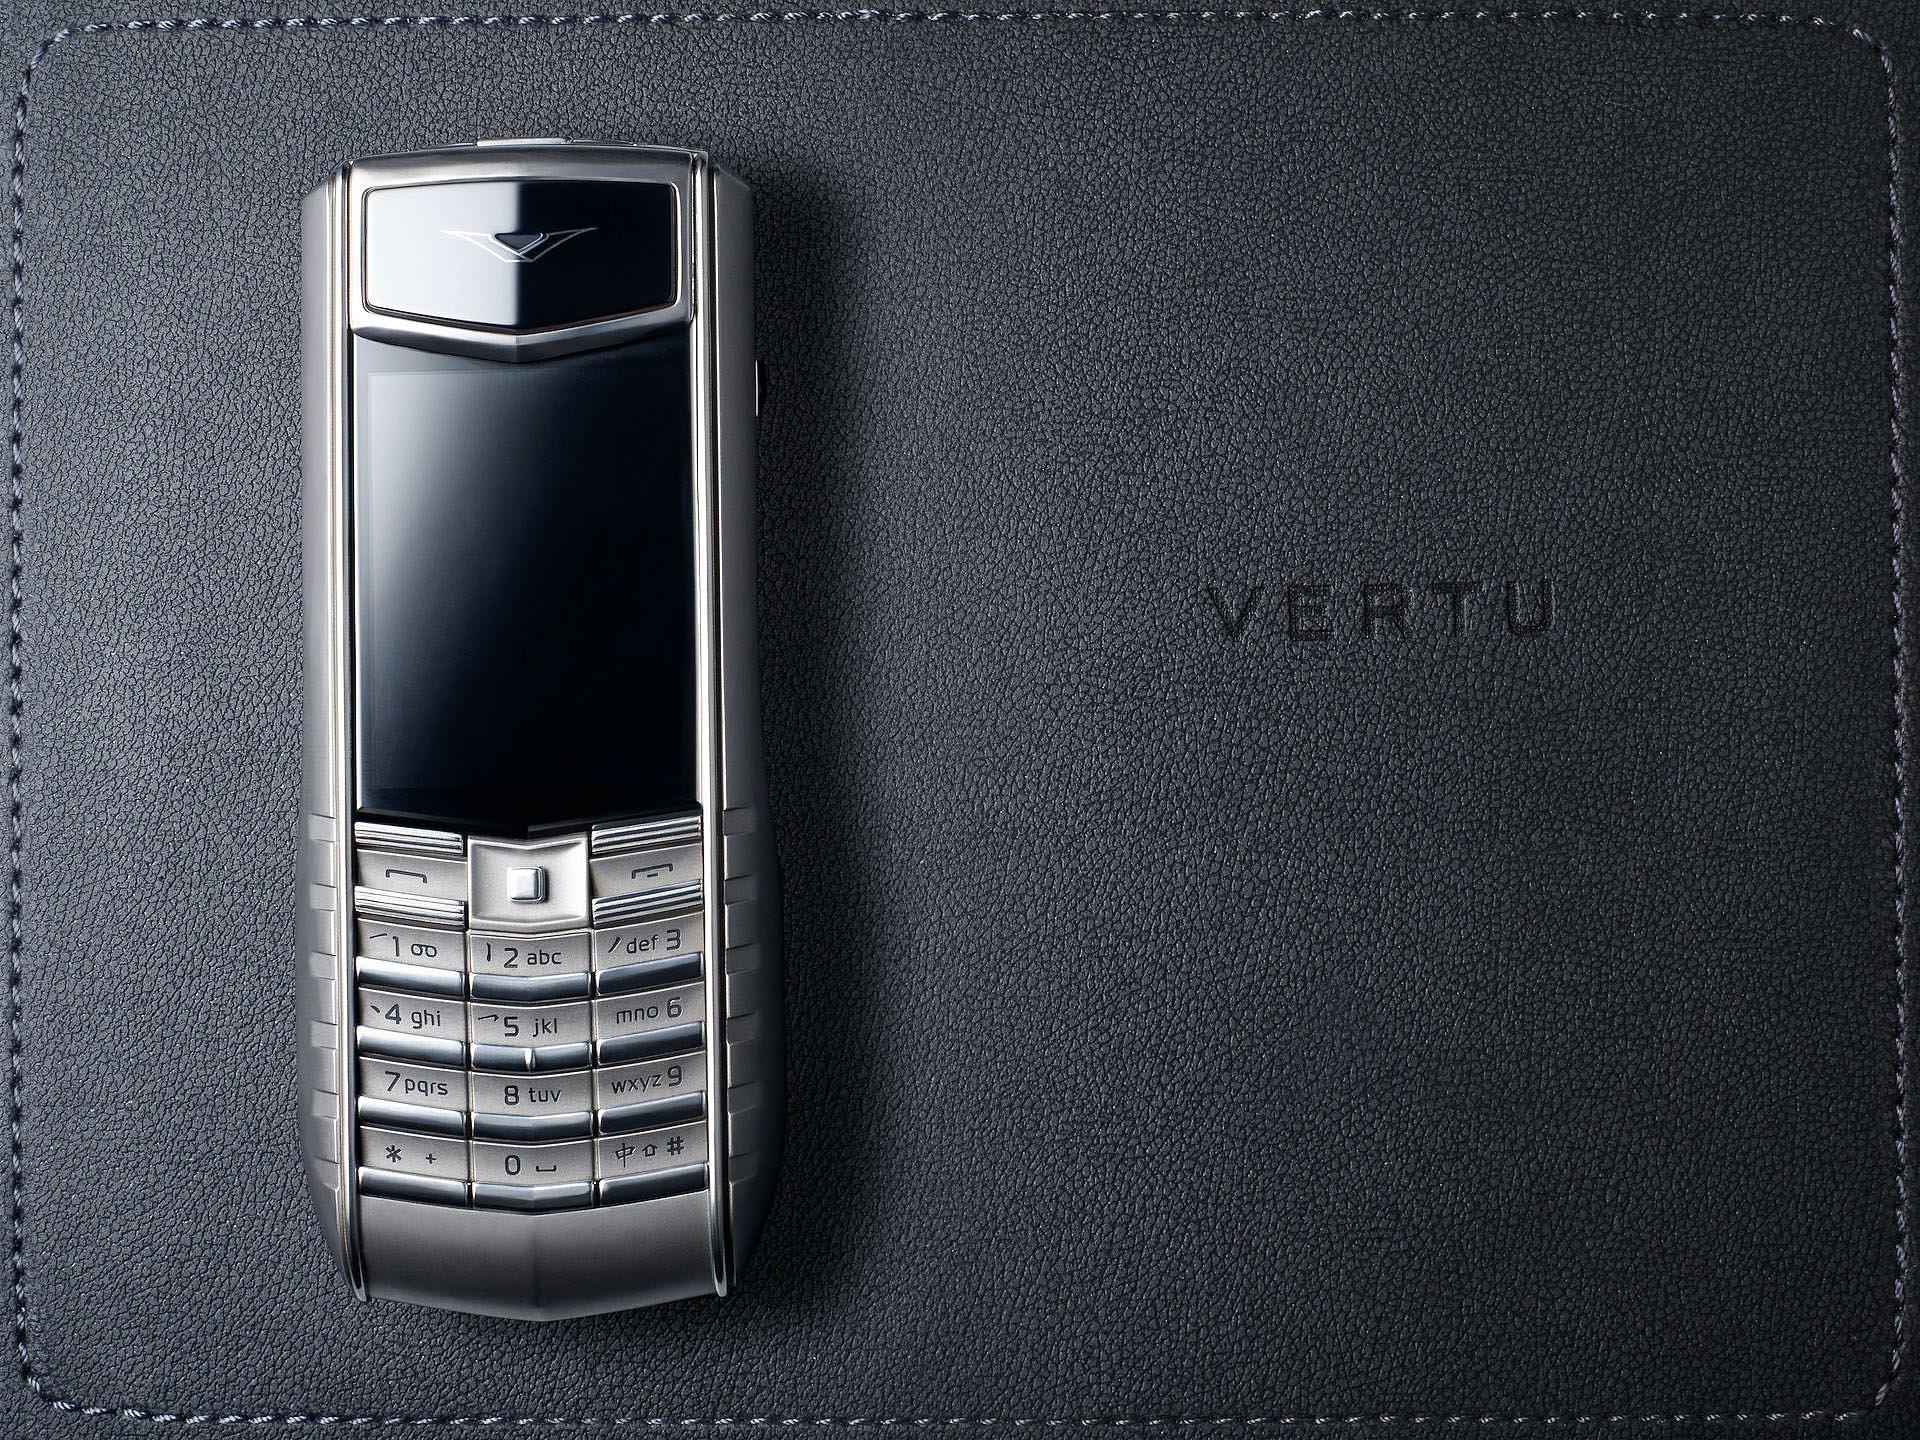 VERTU-com.jpg